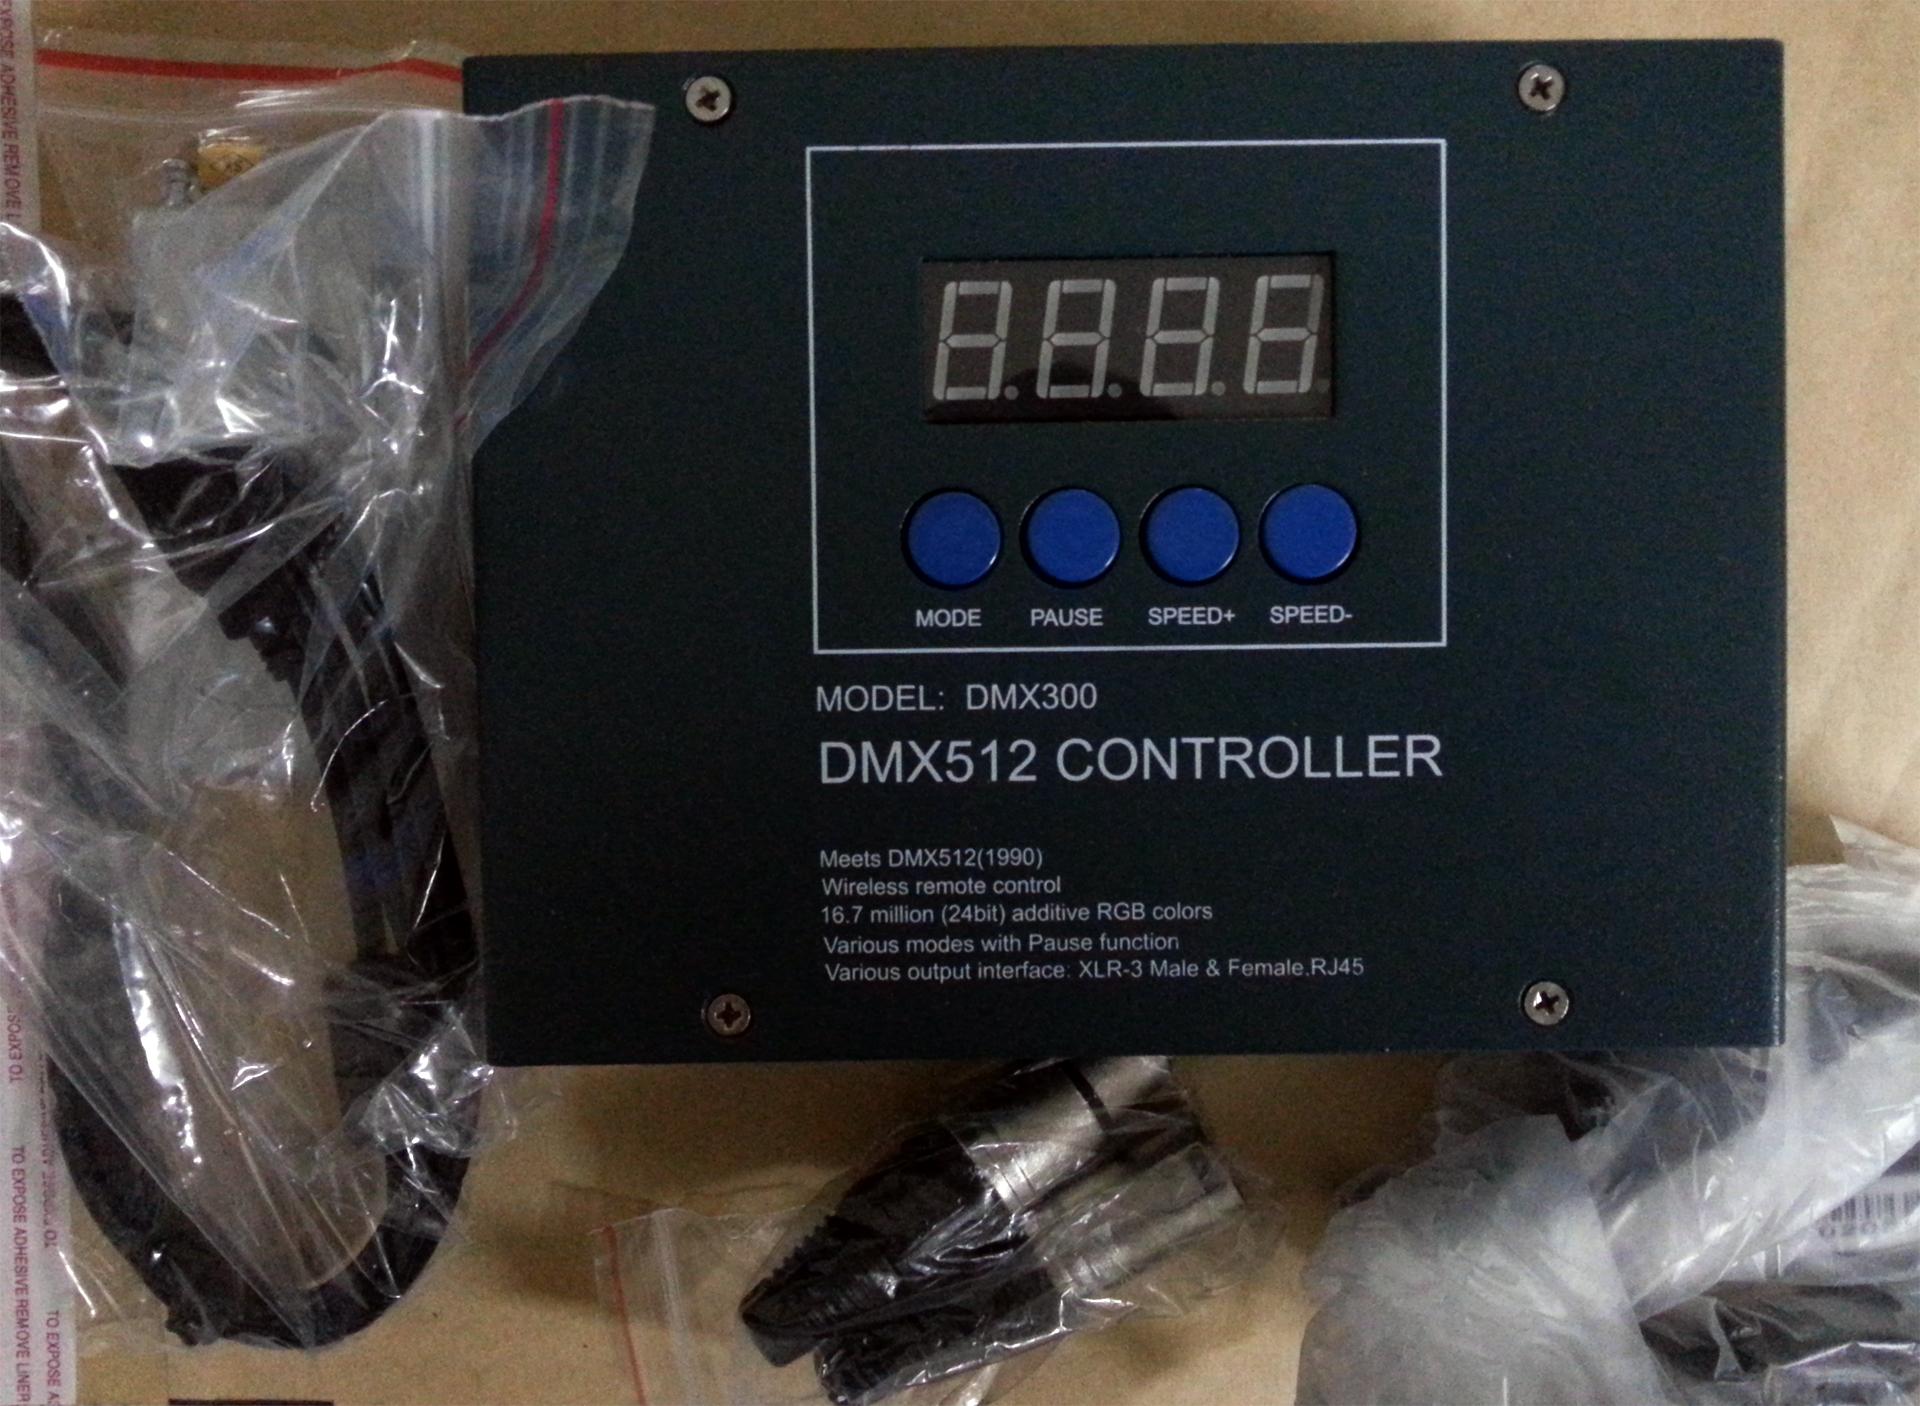 RF_wireless_remote_DMX300_DMX512_LED_controller